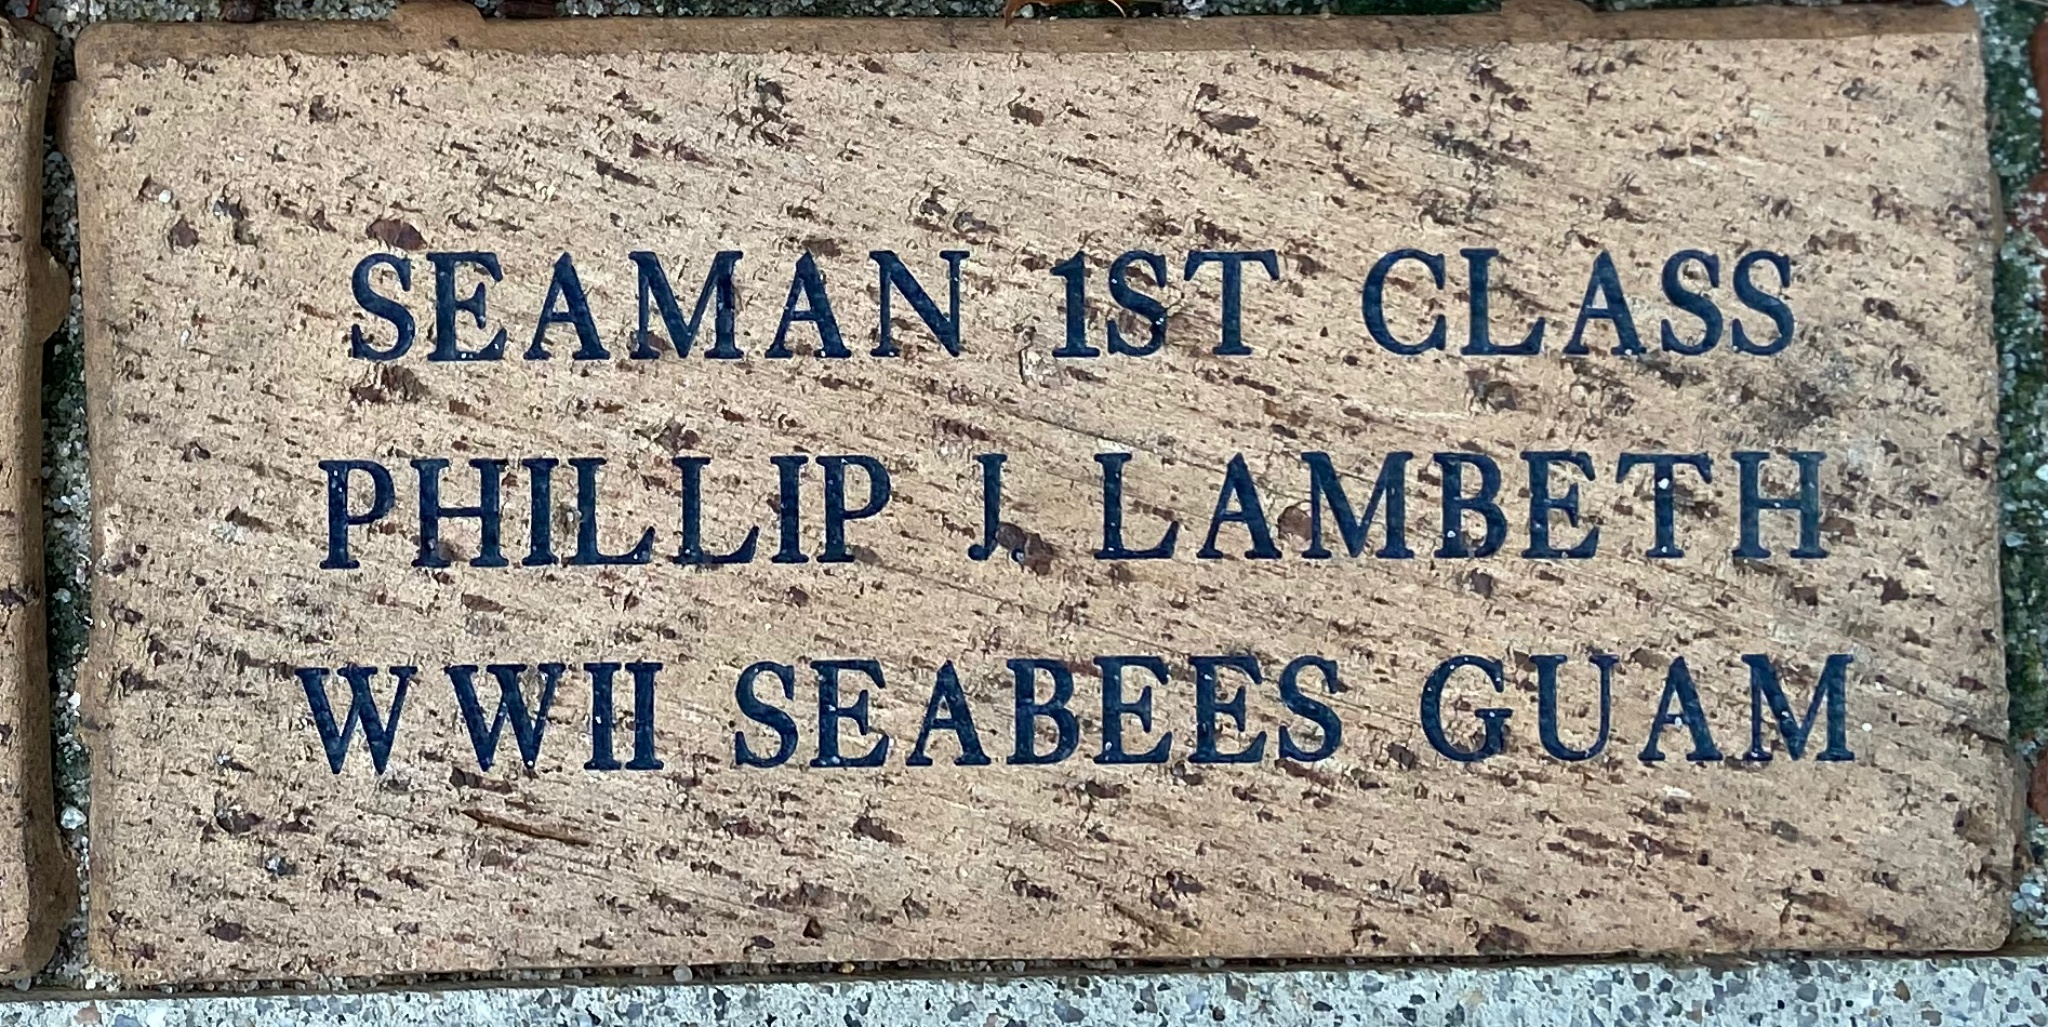 SEAMAN 1ST CLASS PHILLIP J LAMBETH WWII SEABEES GUAM